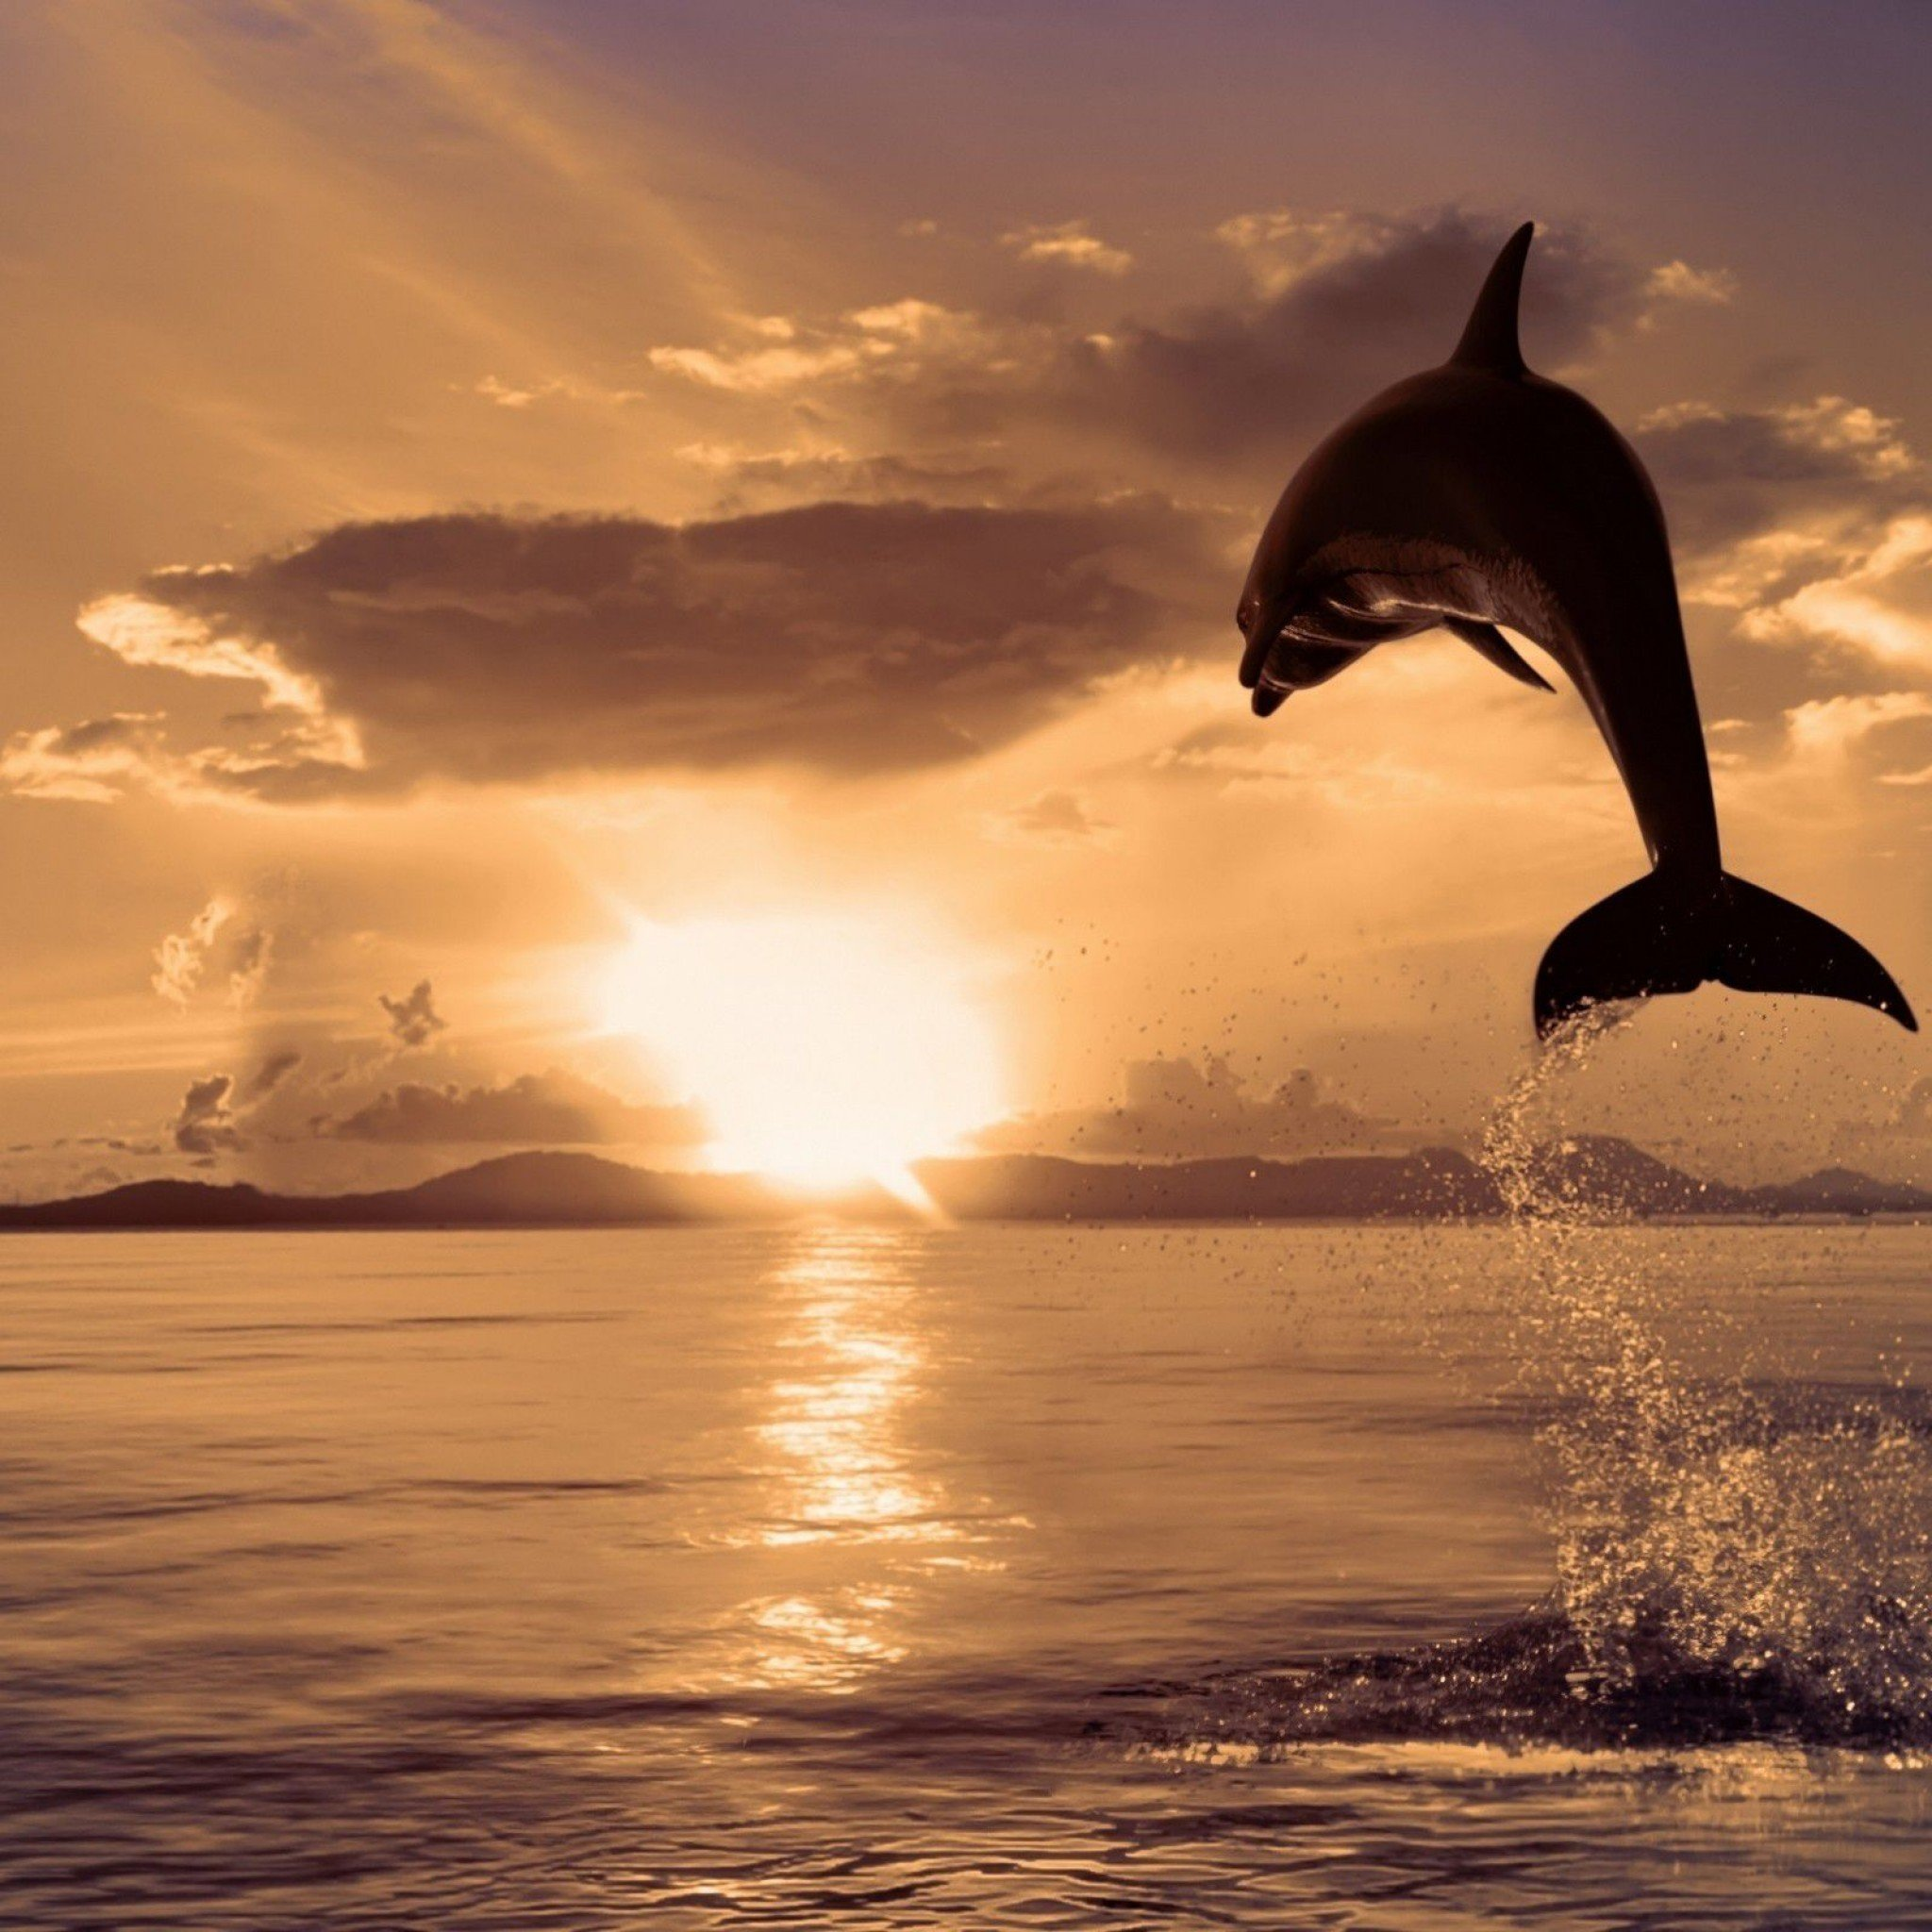 Dolphin Wallpaper HD 1080P